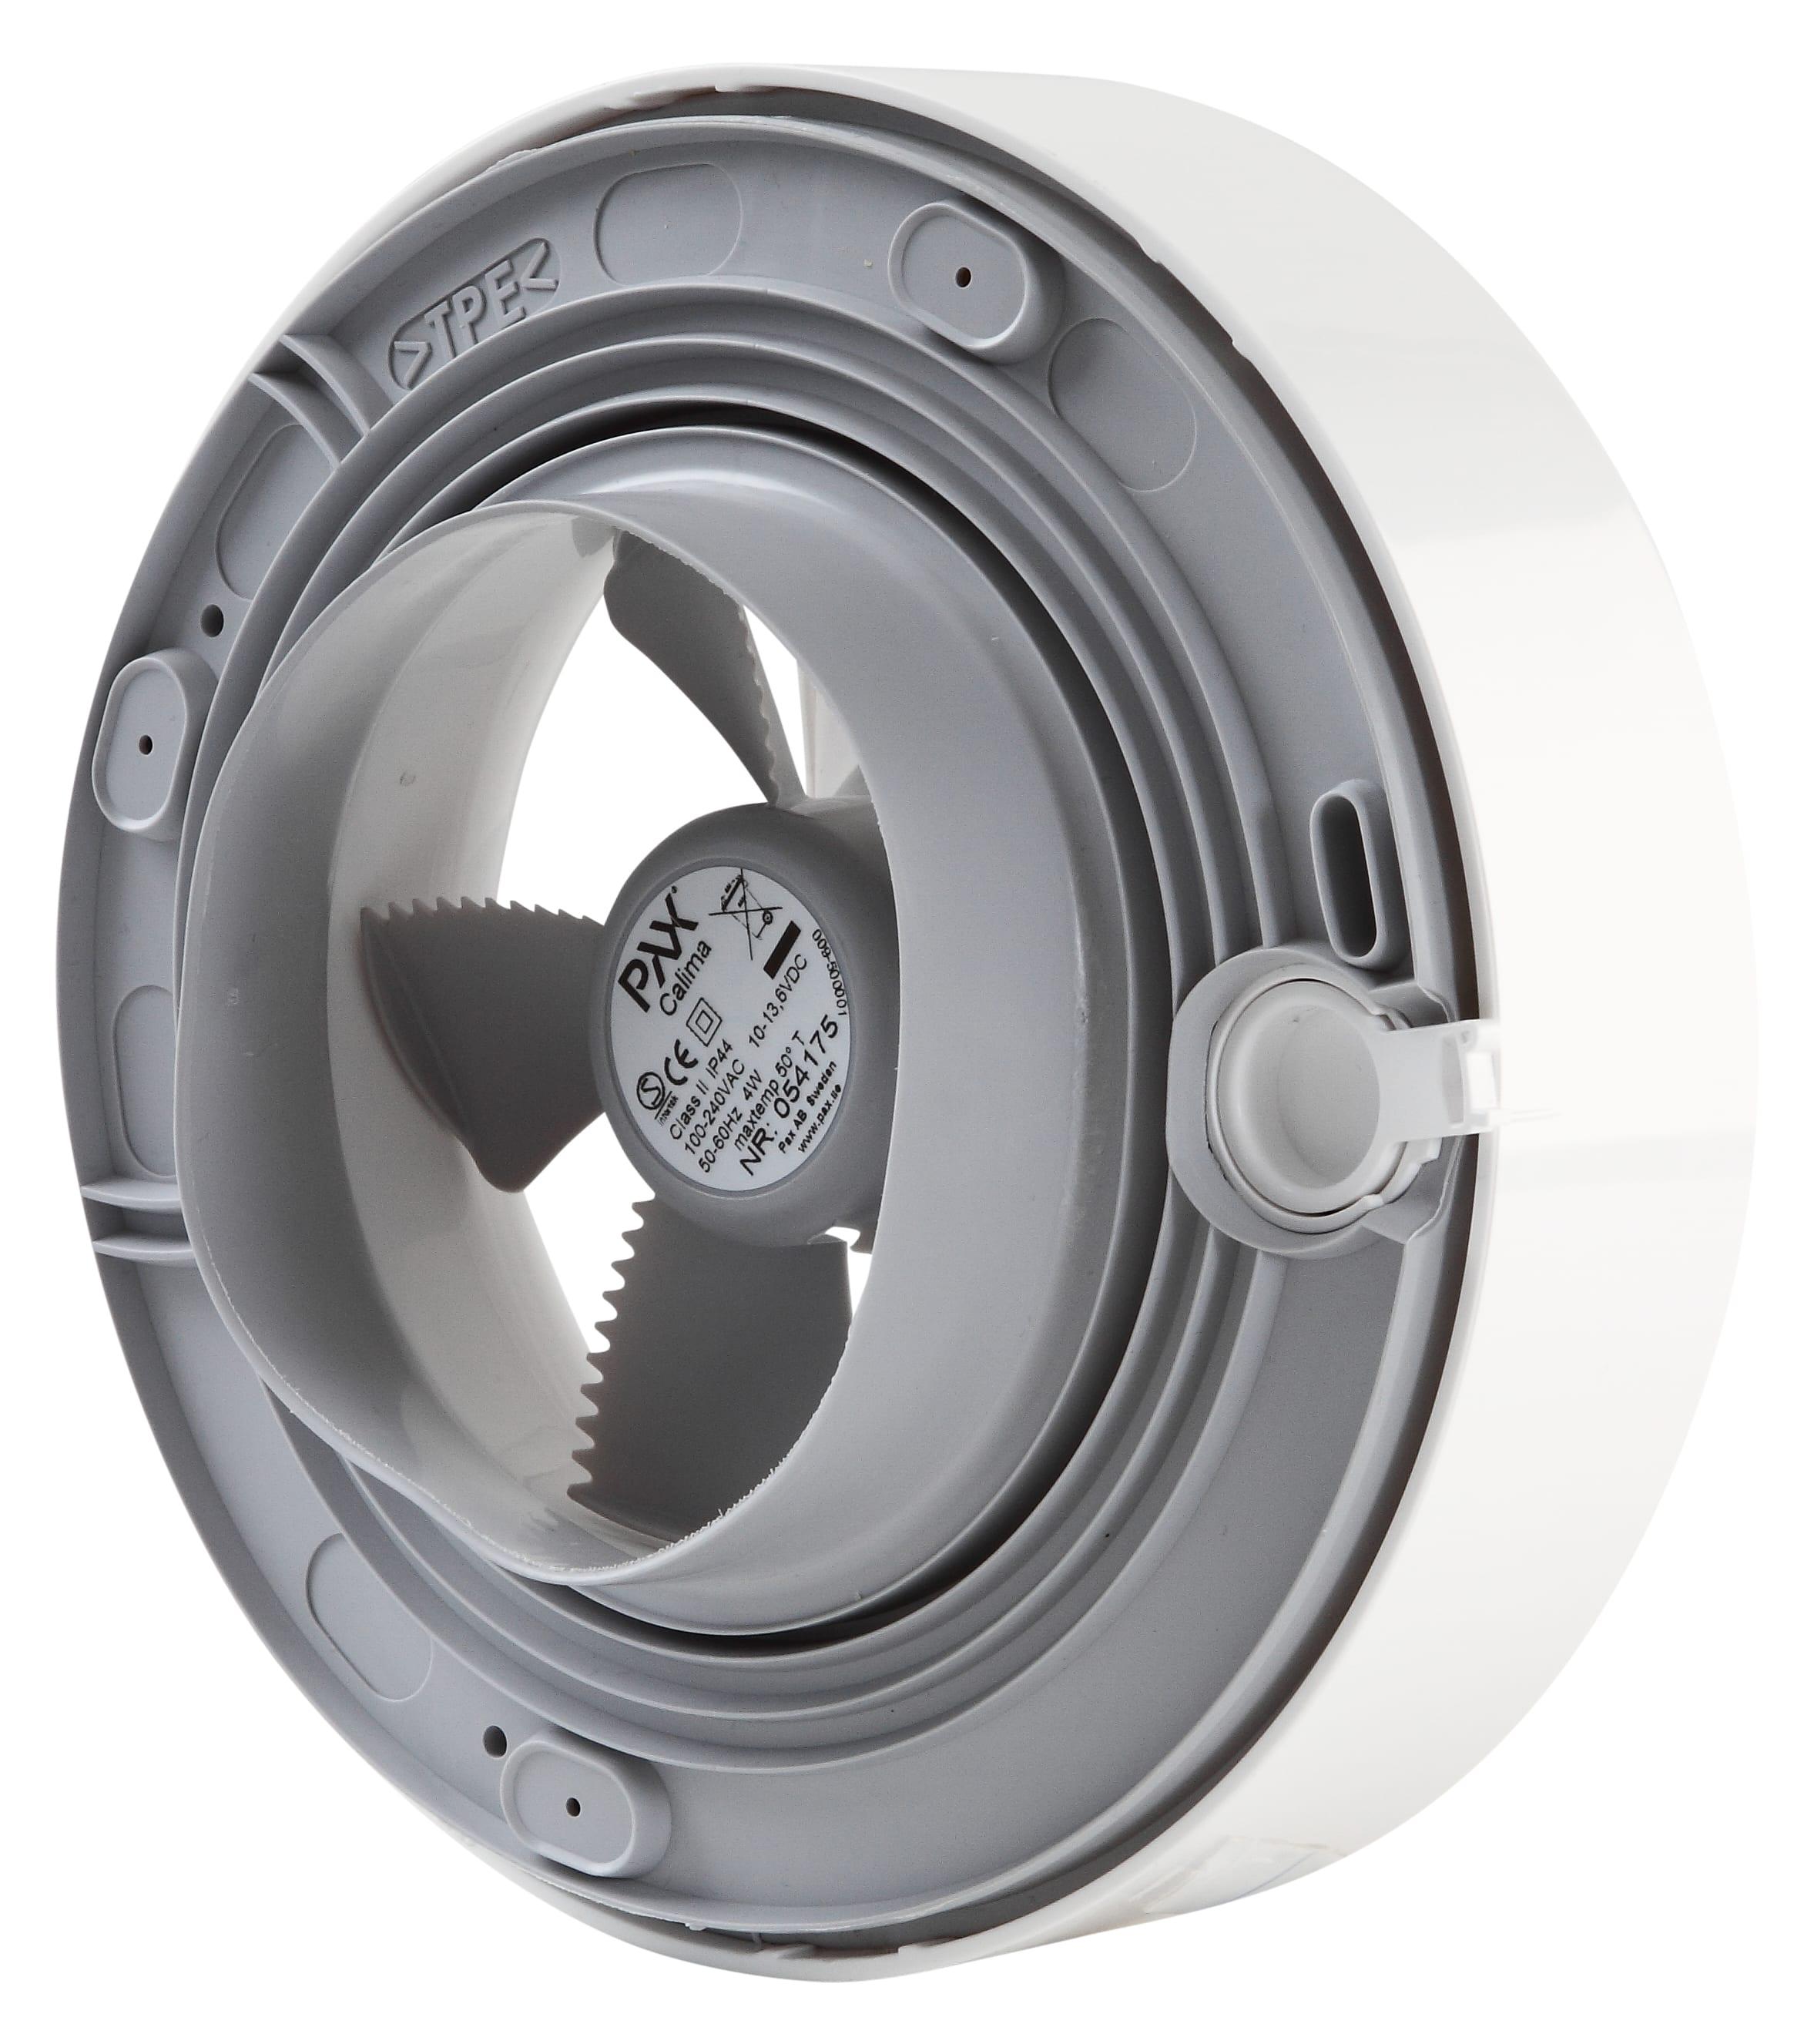 Pax Calima Bluetooth Ventilator